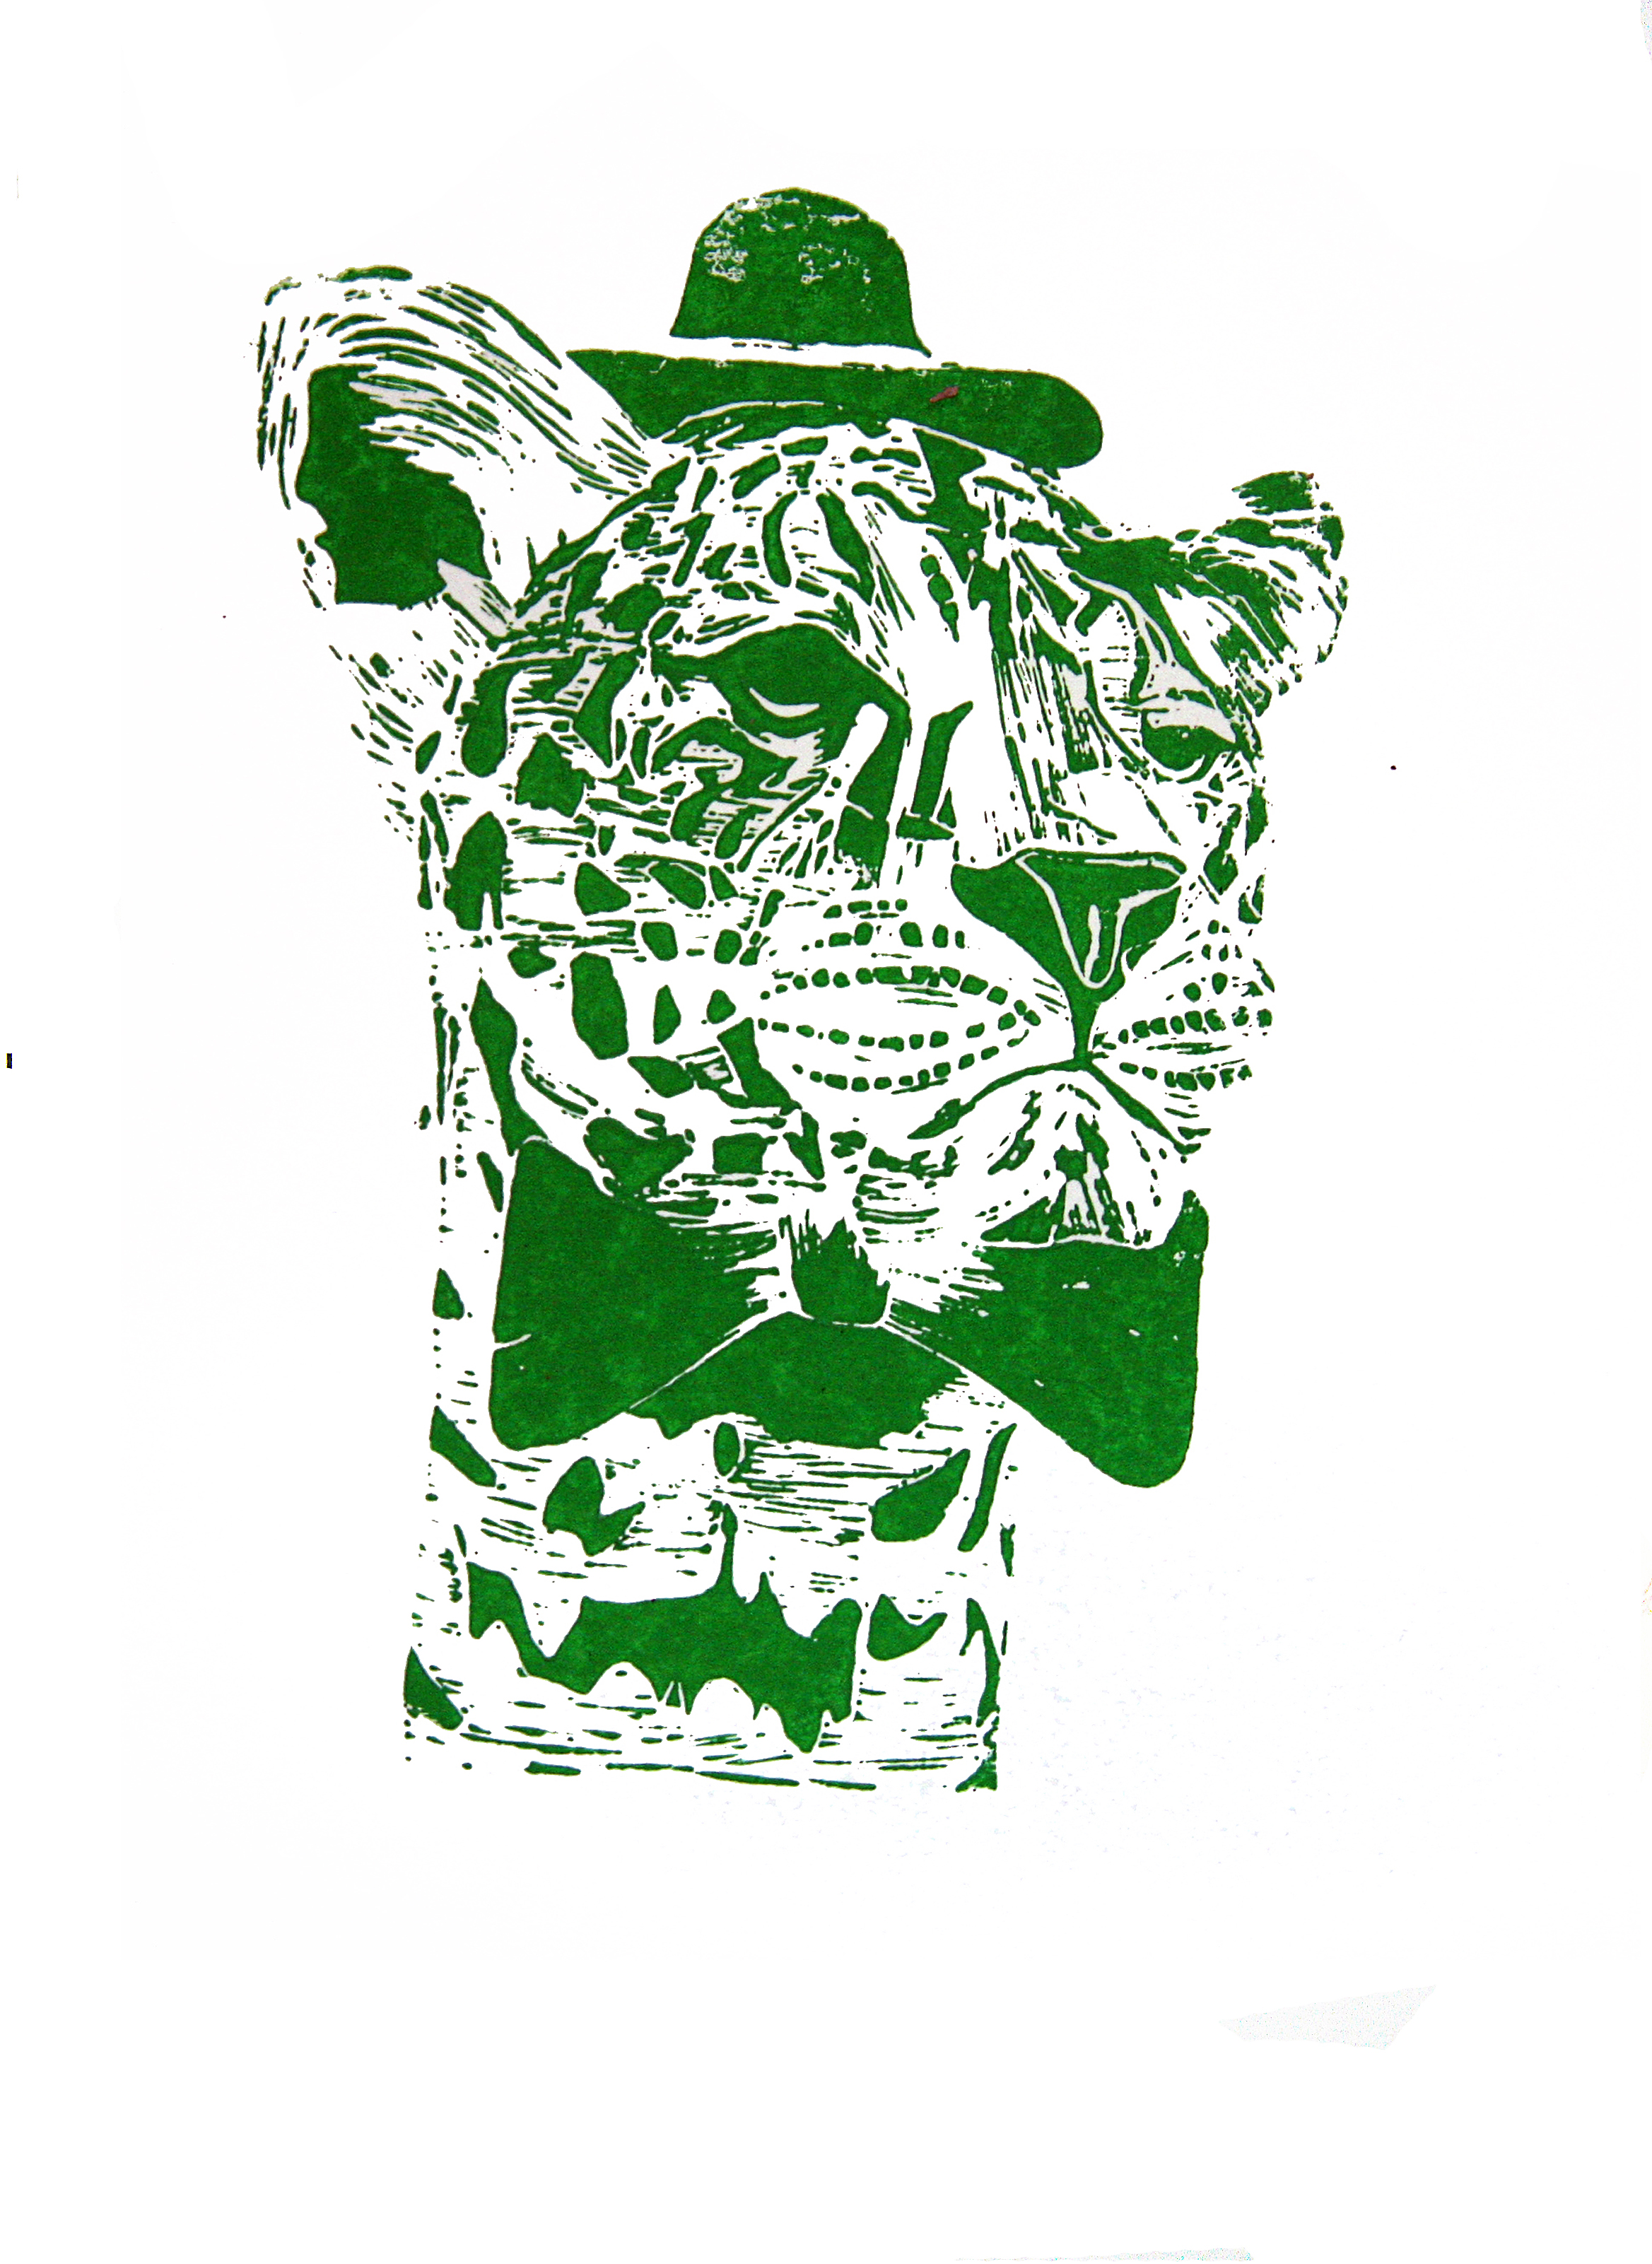 'Mr Leopard' (green), linocut print on paper,  42cm x 59.4cm, 2016